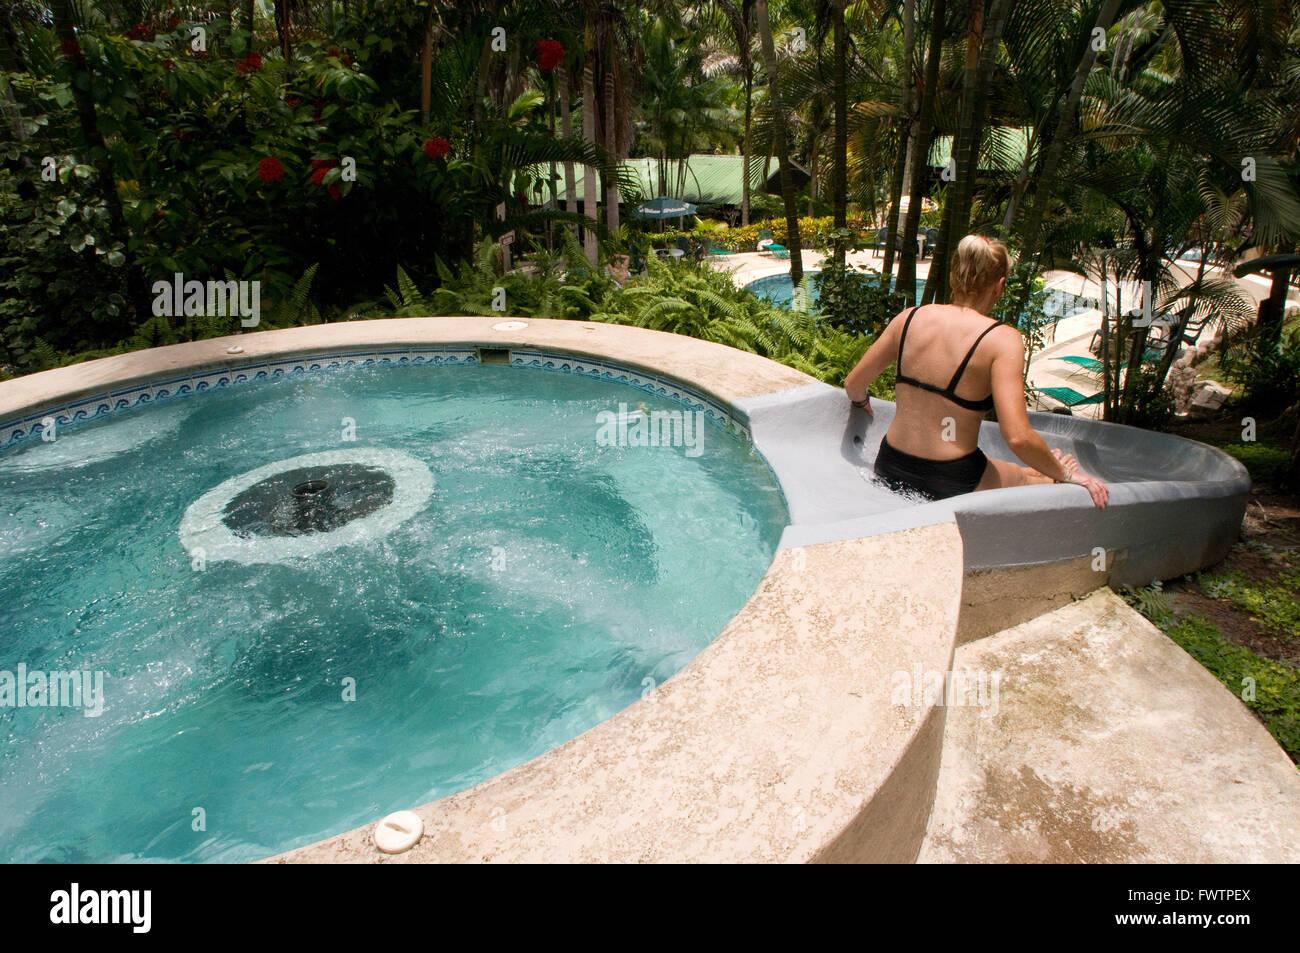 Swimming Pool, Whirlpool Ceiba Tops Luxury Lodge Explorama, Iquitos,  Loreto, Peru. Lodge Bungalow Apartments At Ceiba Tops A Explorama Jungle  Lodge In The ...